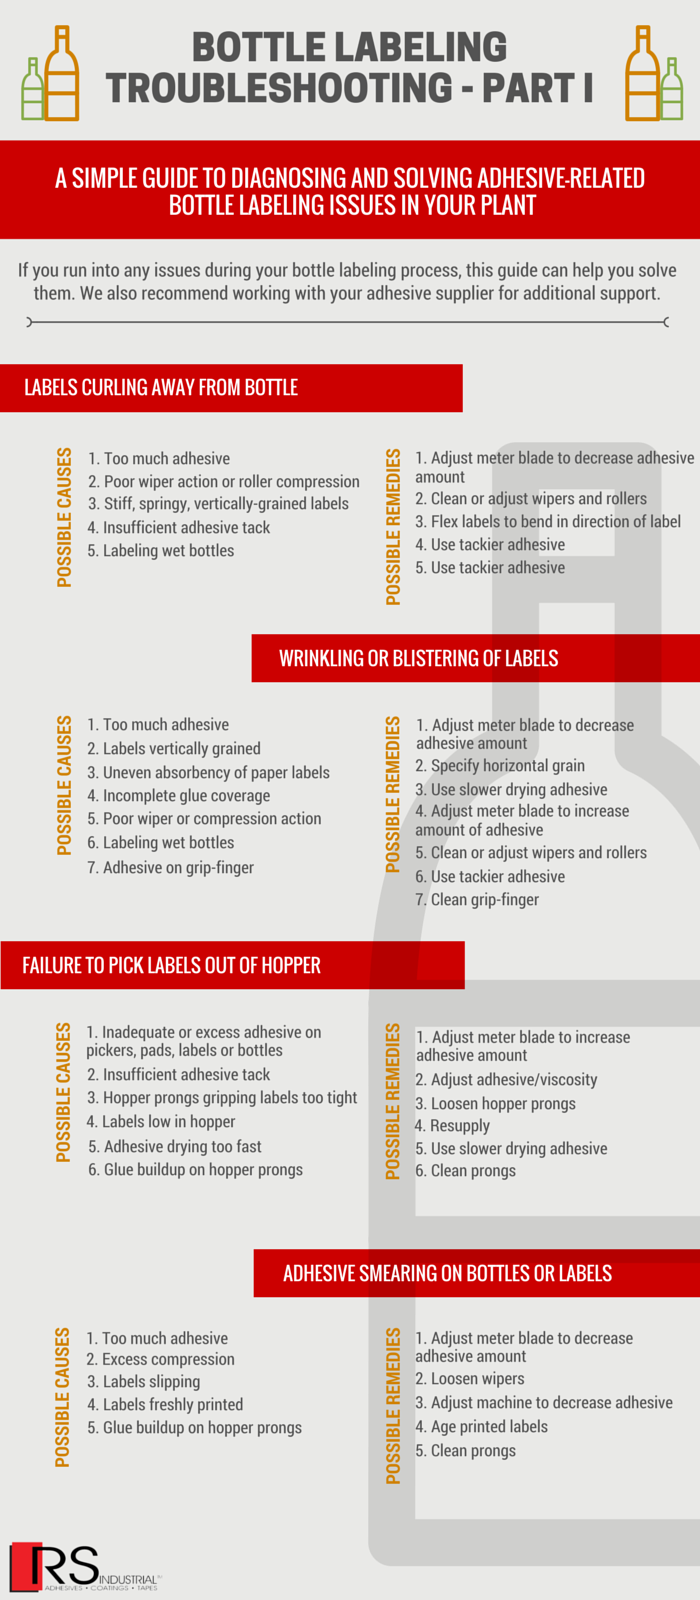 Bottle Labeling Troubleshooting Part I infographic